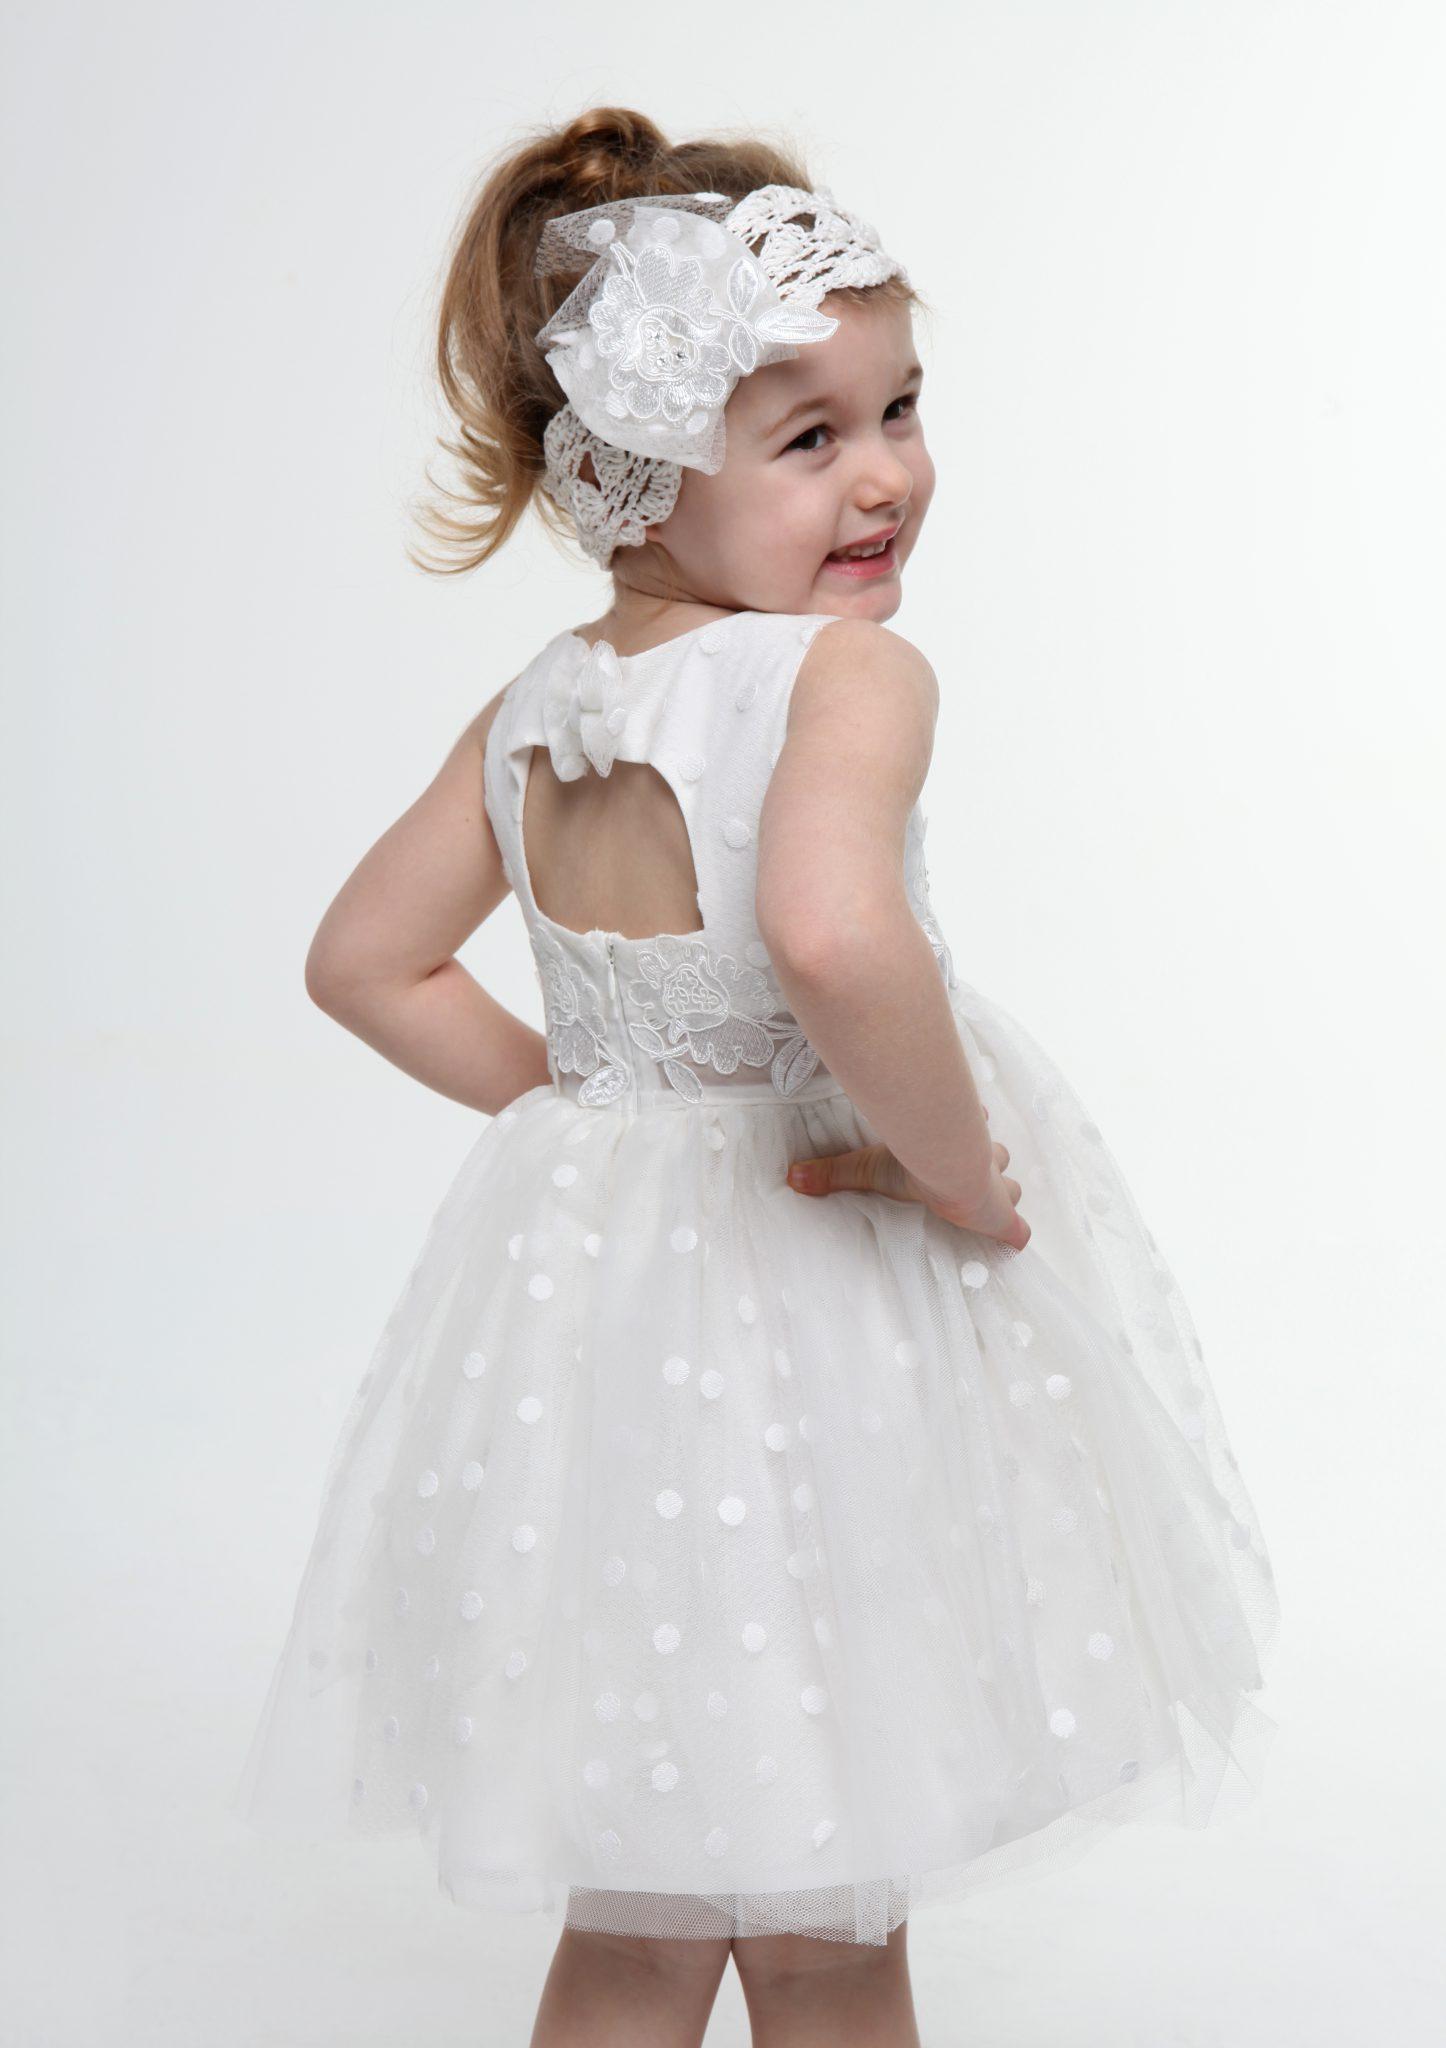 13bcc35d3a8 Βαπτιστικά Ρούχα για Κορίτσι 60 | Γάμος & Βάπτιση στο Ηράκλειο Κρήτης